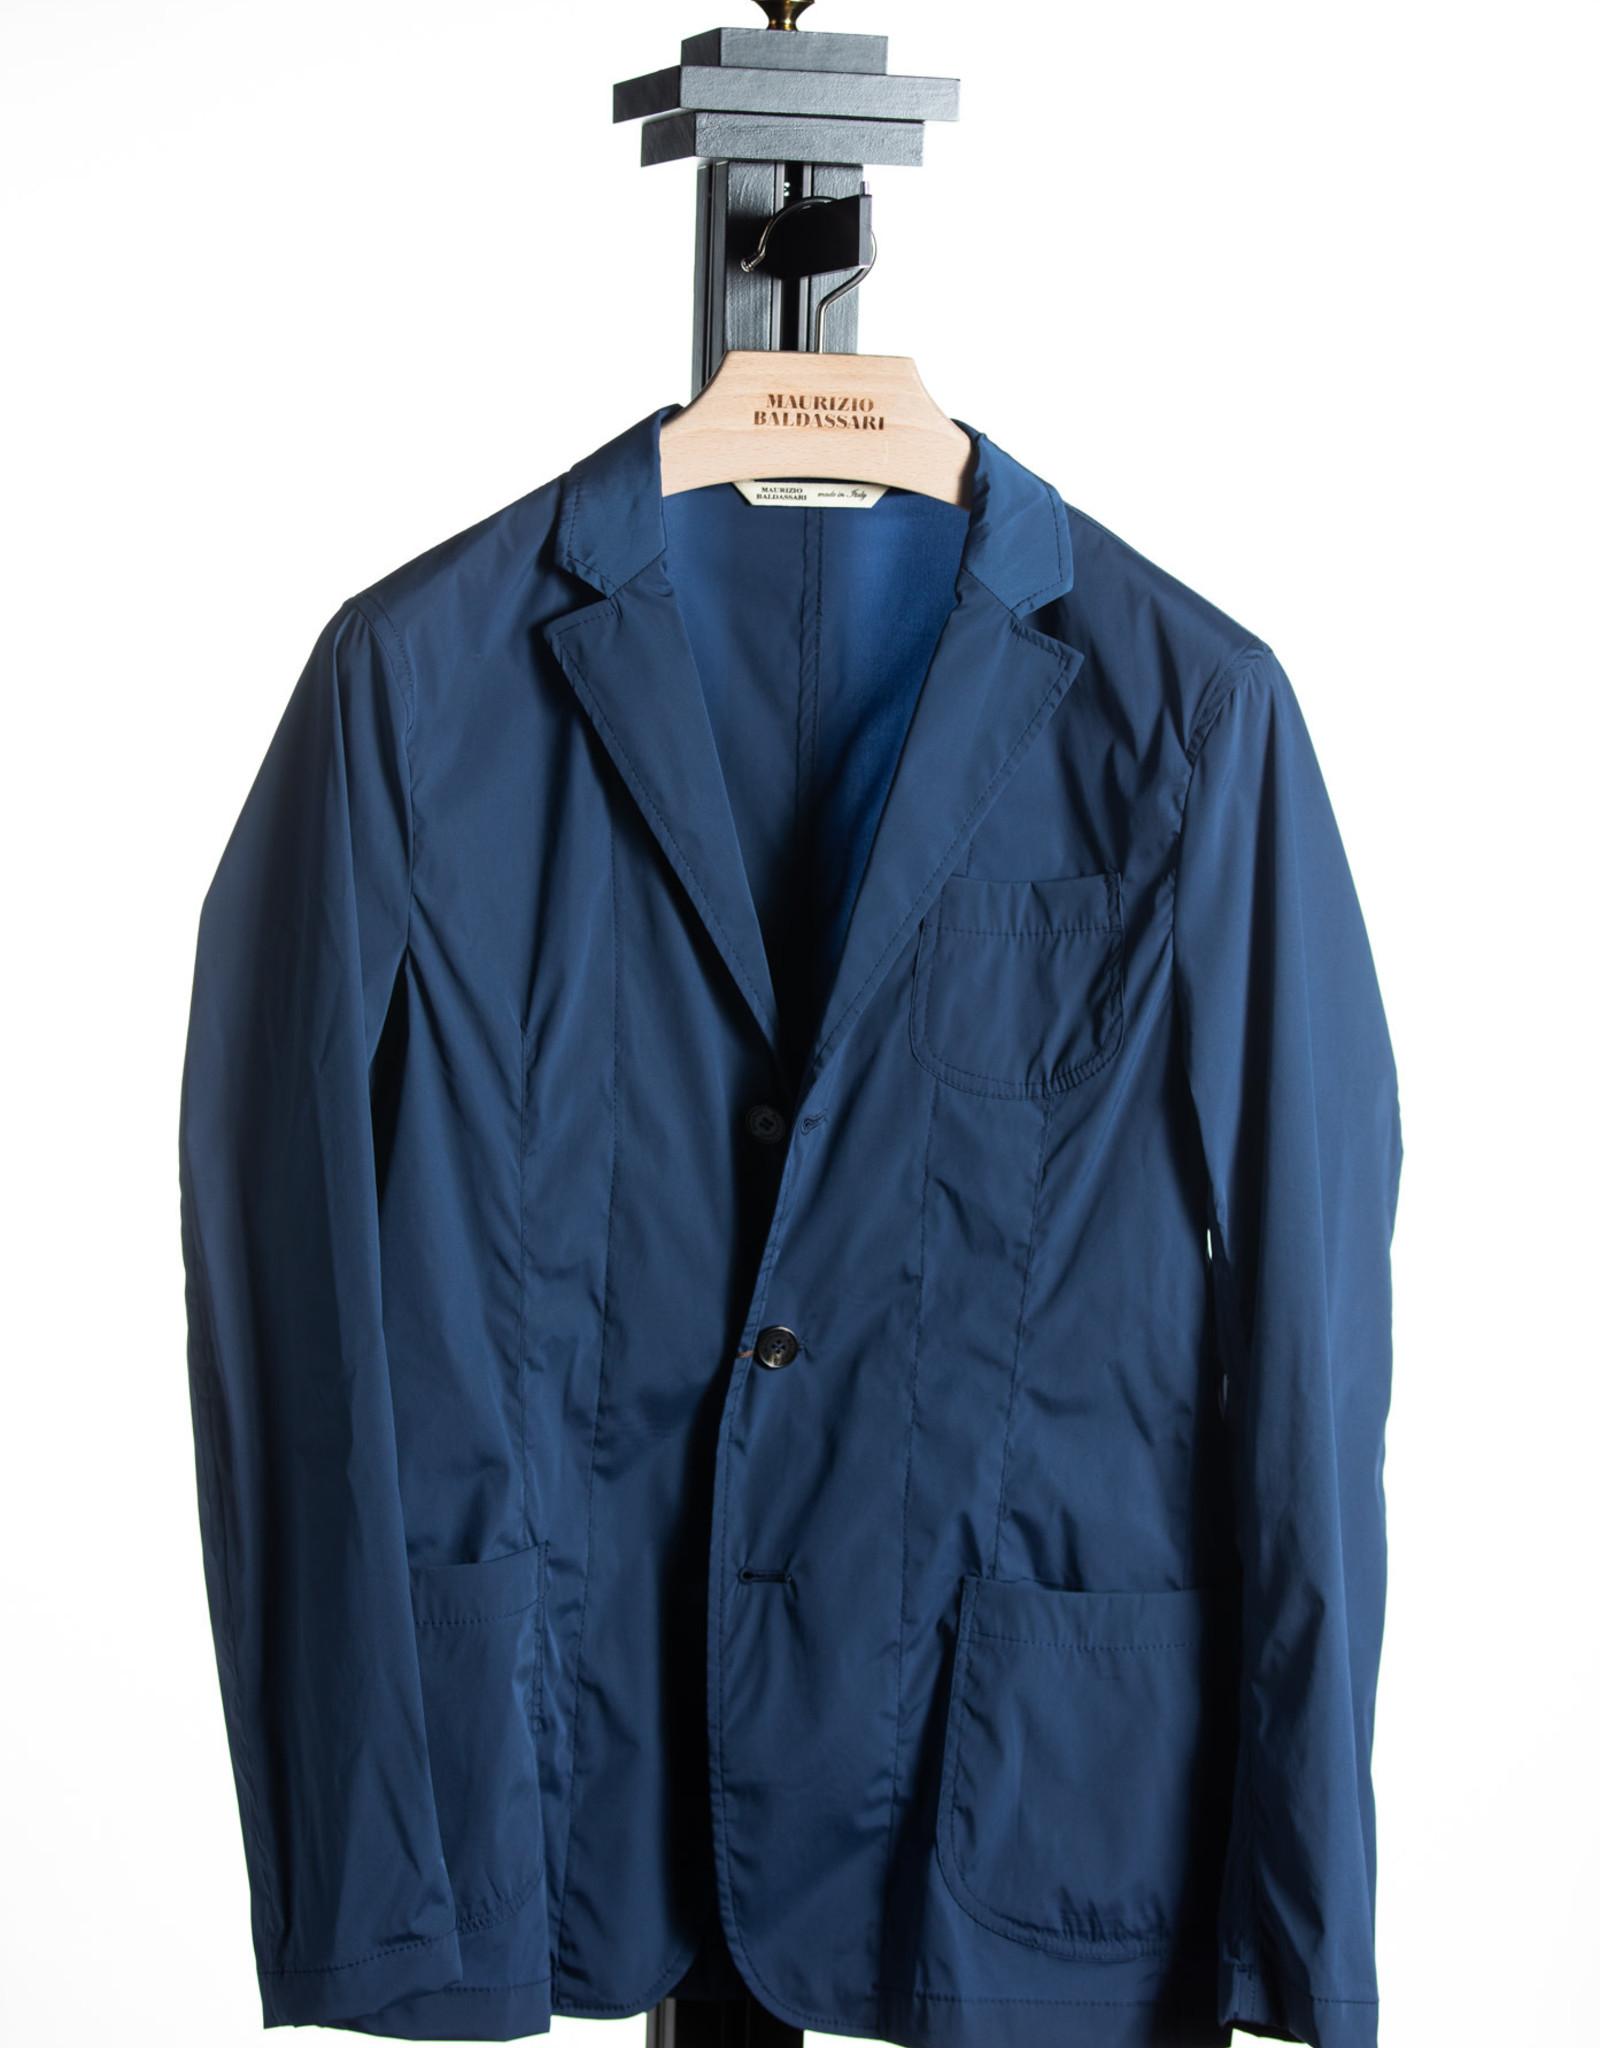 MAURIZIO BALDASSARI Nylon Stretch Jacket